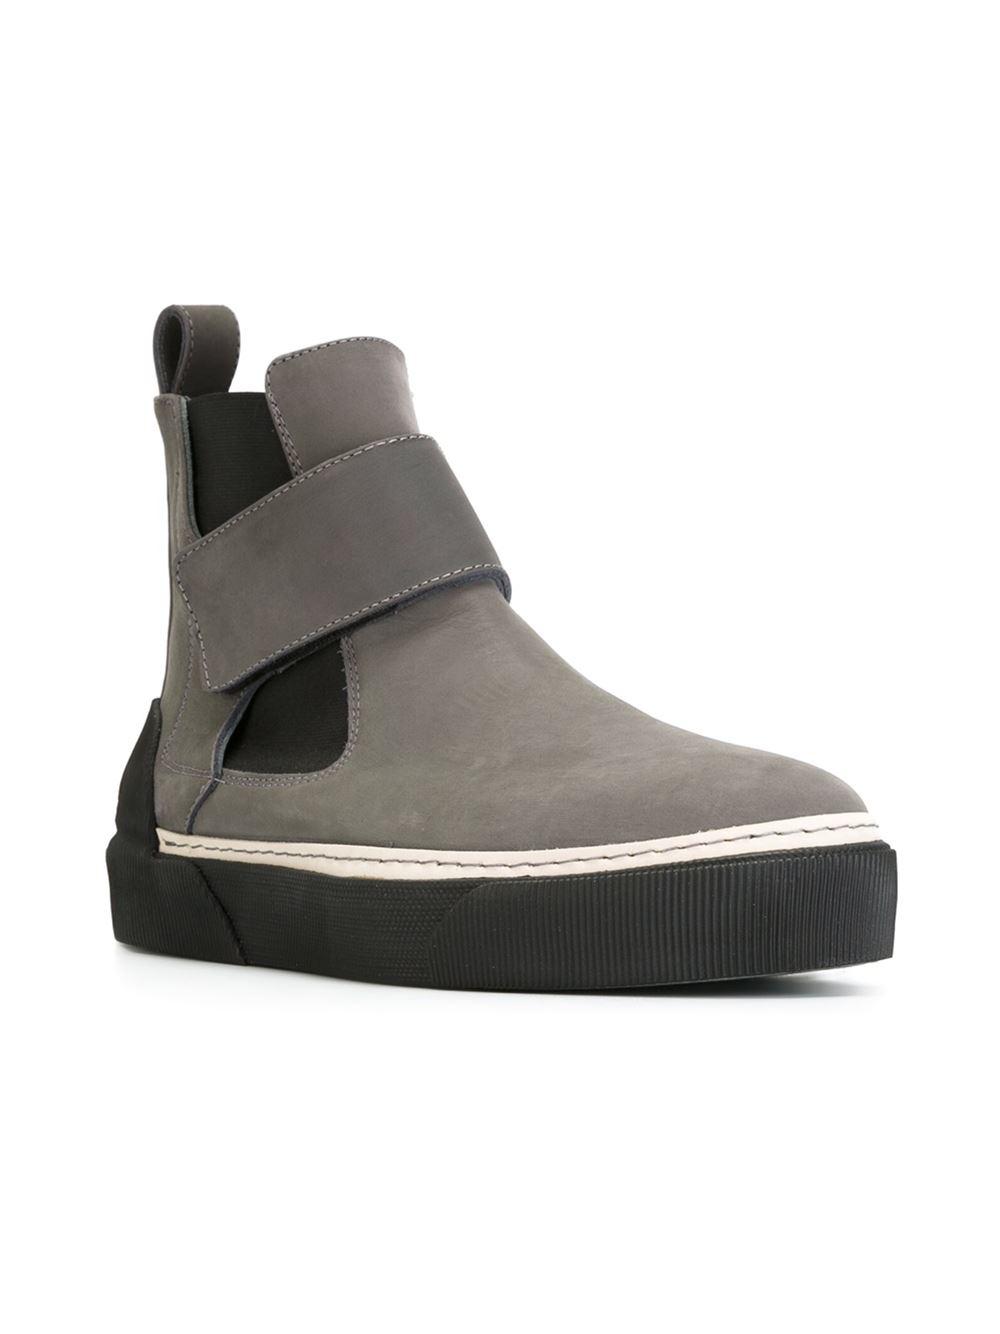 Lanvin Velcro Mid Sneakers in Gray for Men